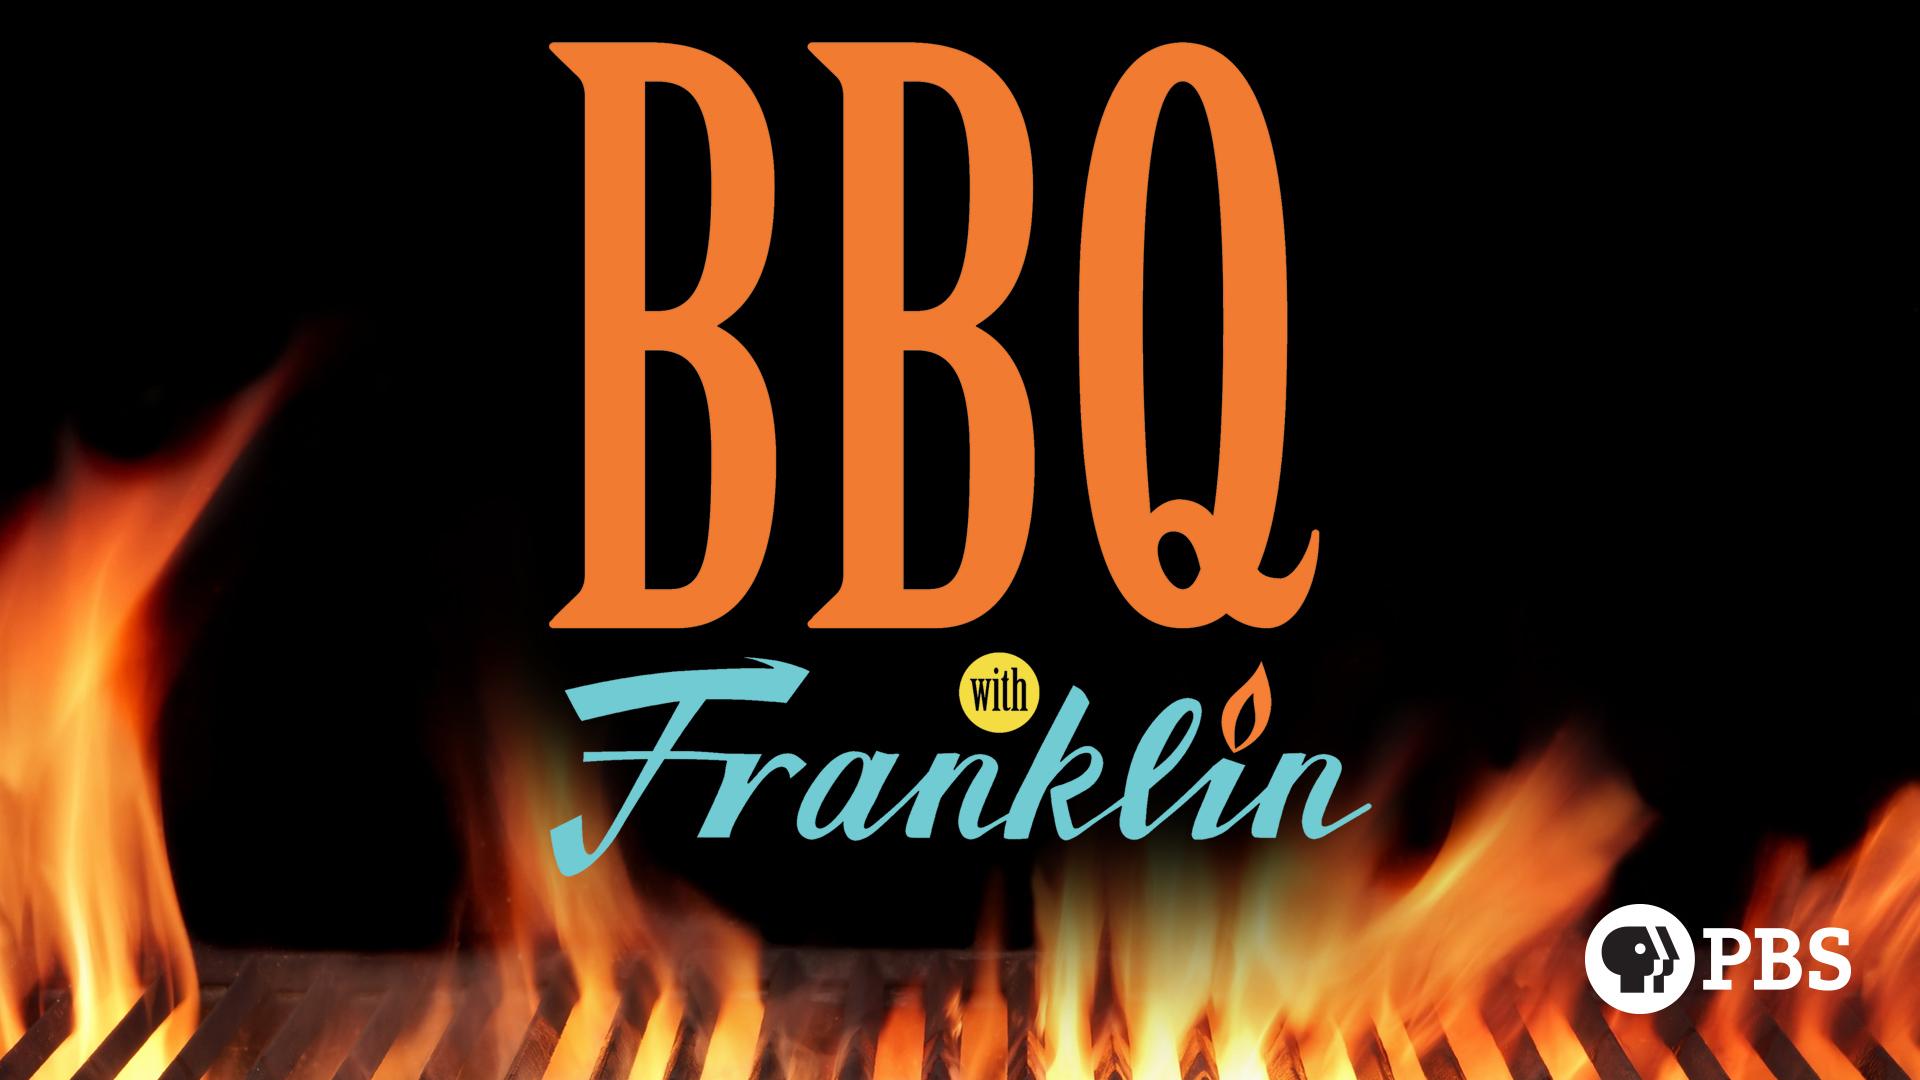 BBQ With Franklin Season 1